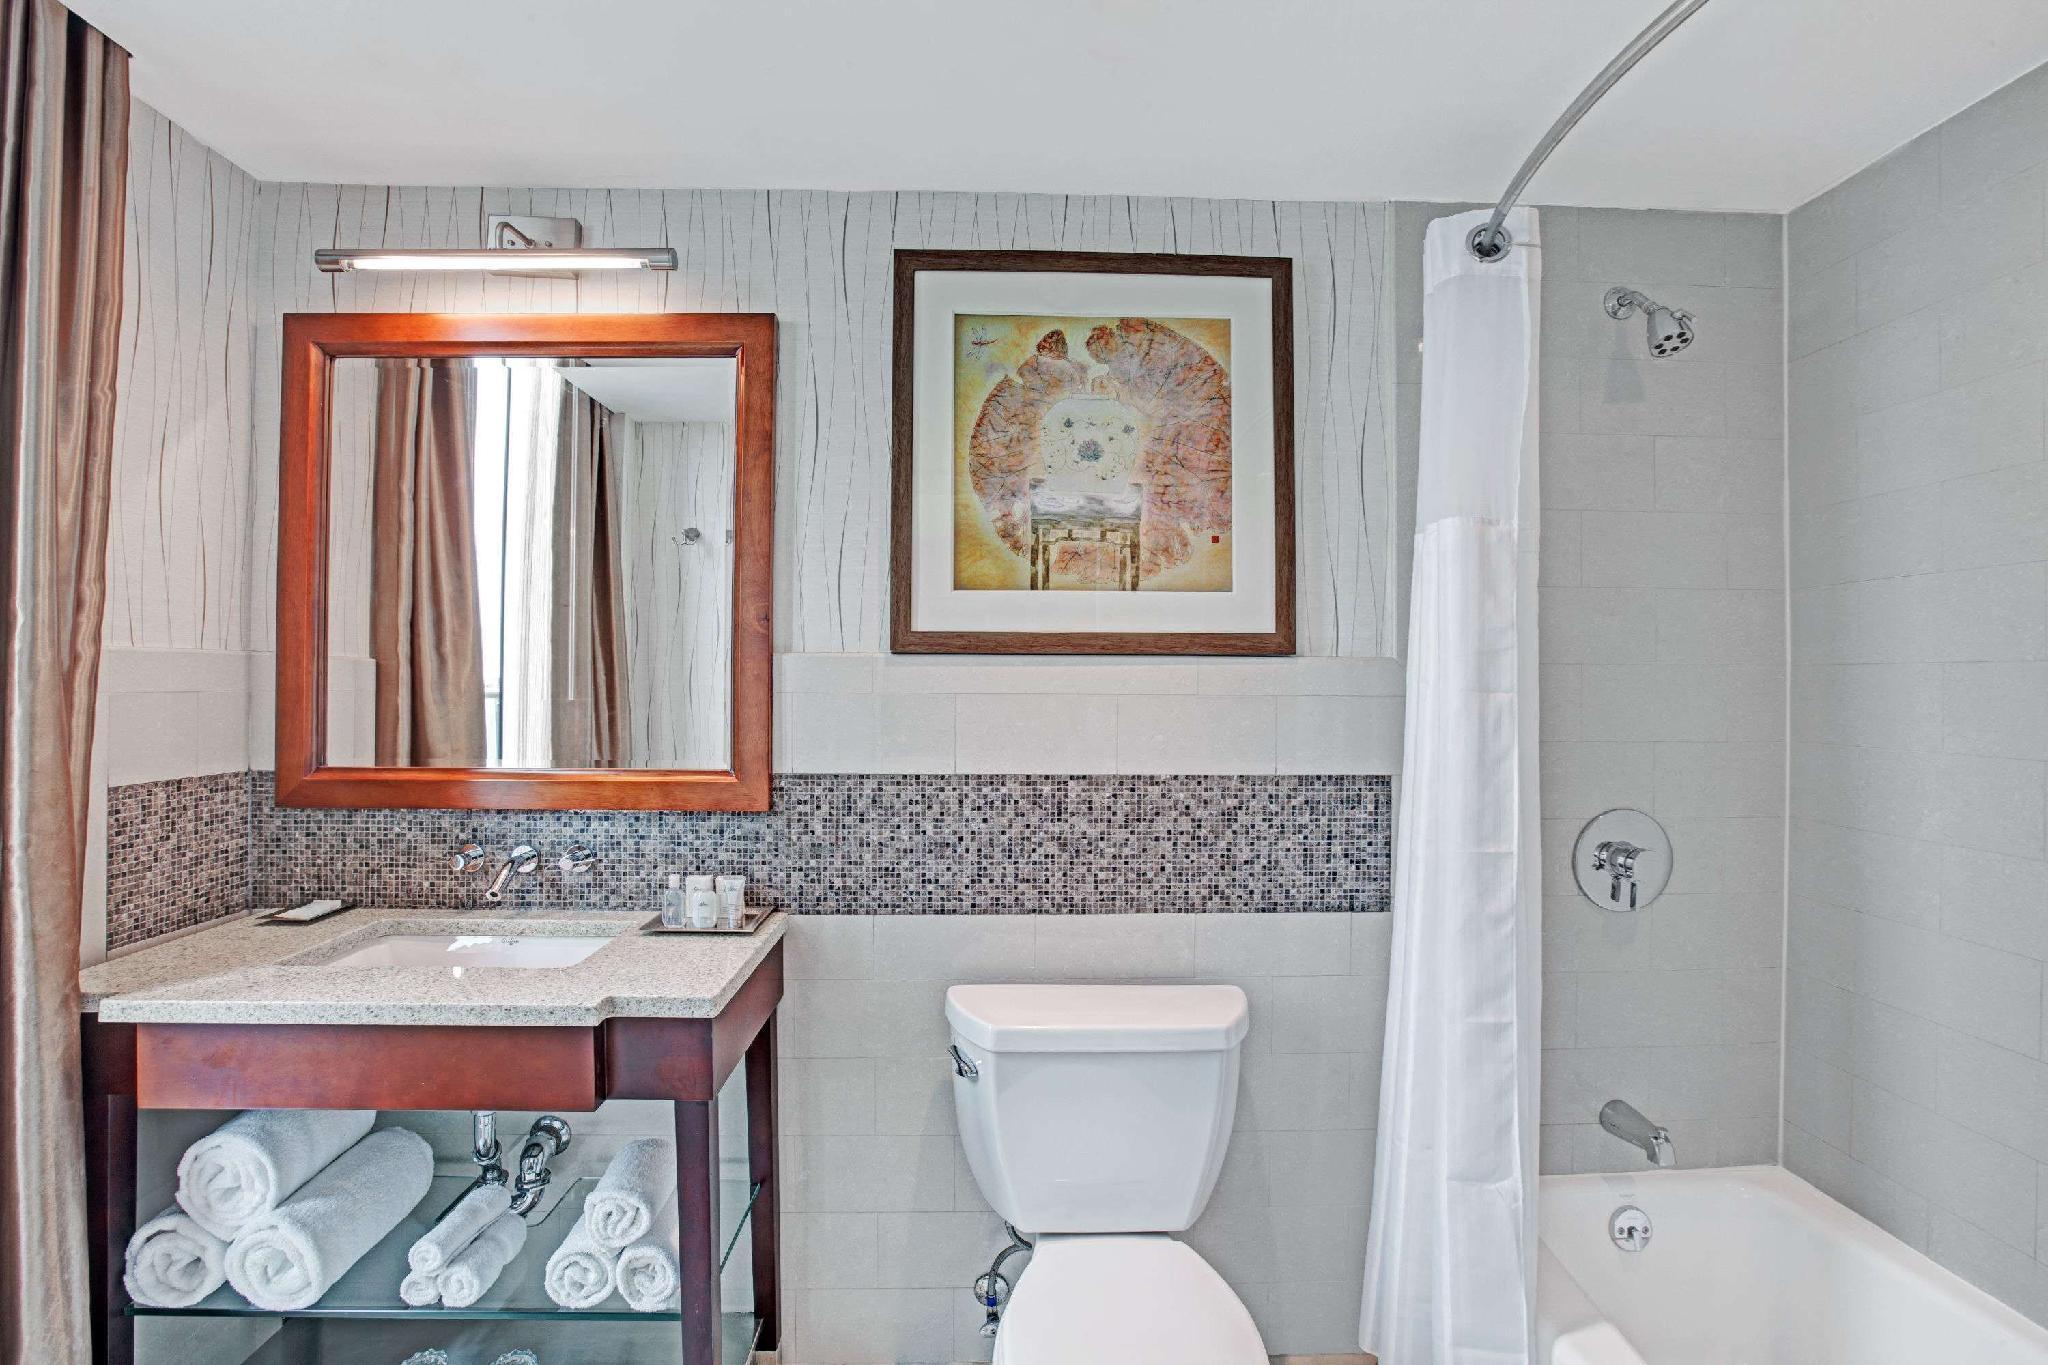 paras kylpy huone kytkeä vuonna NYC